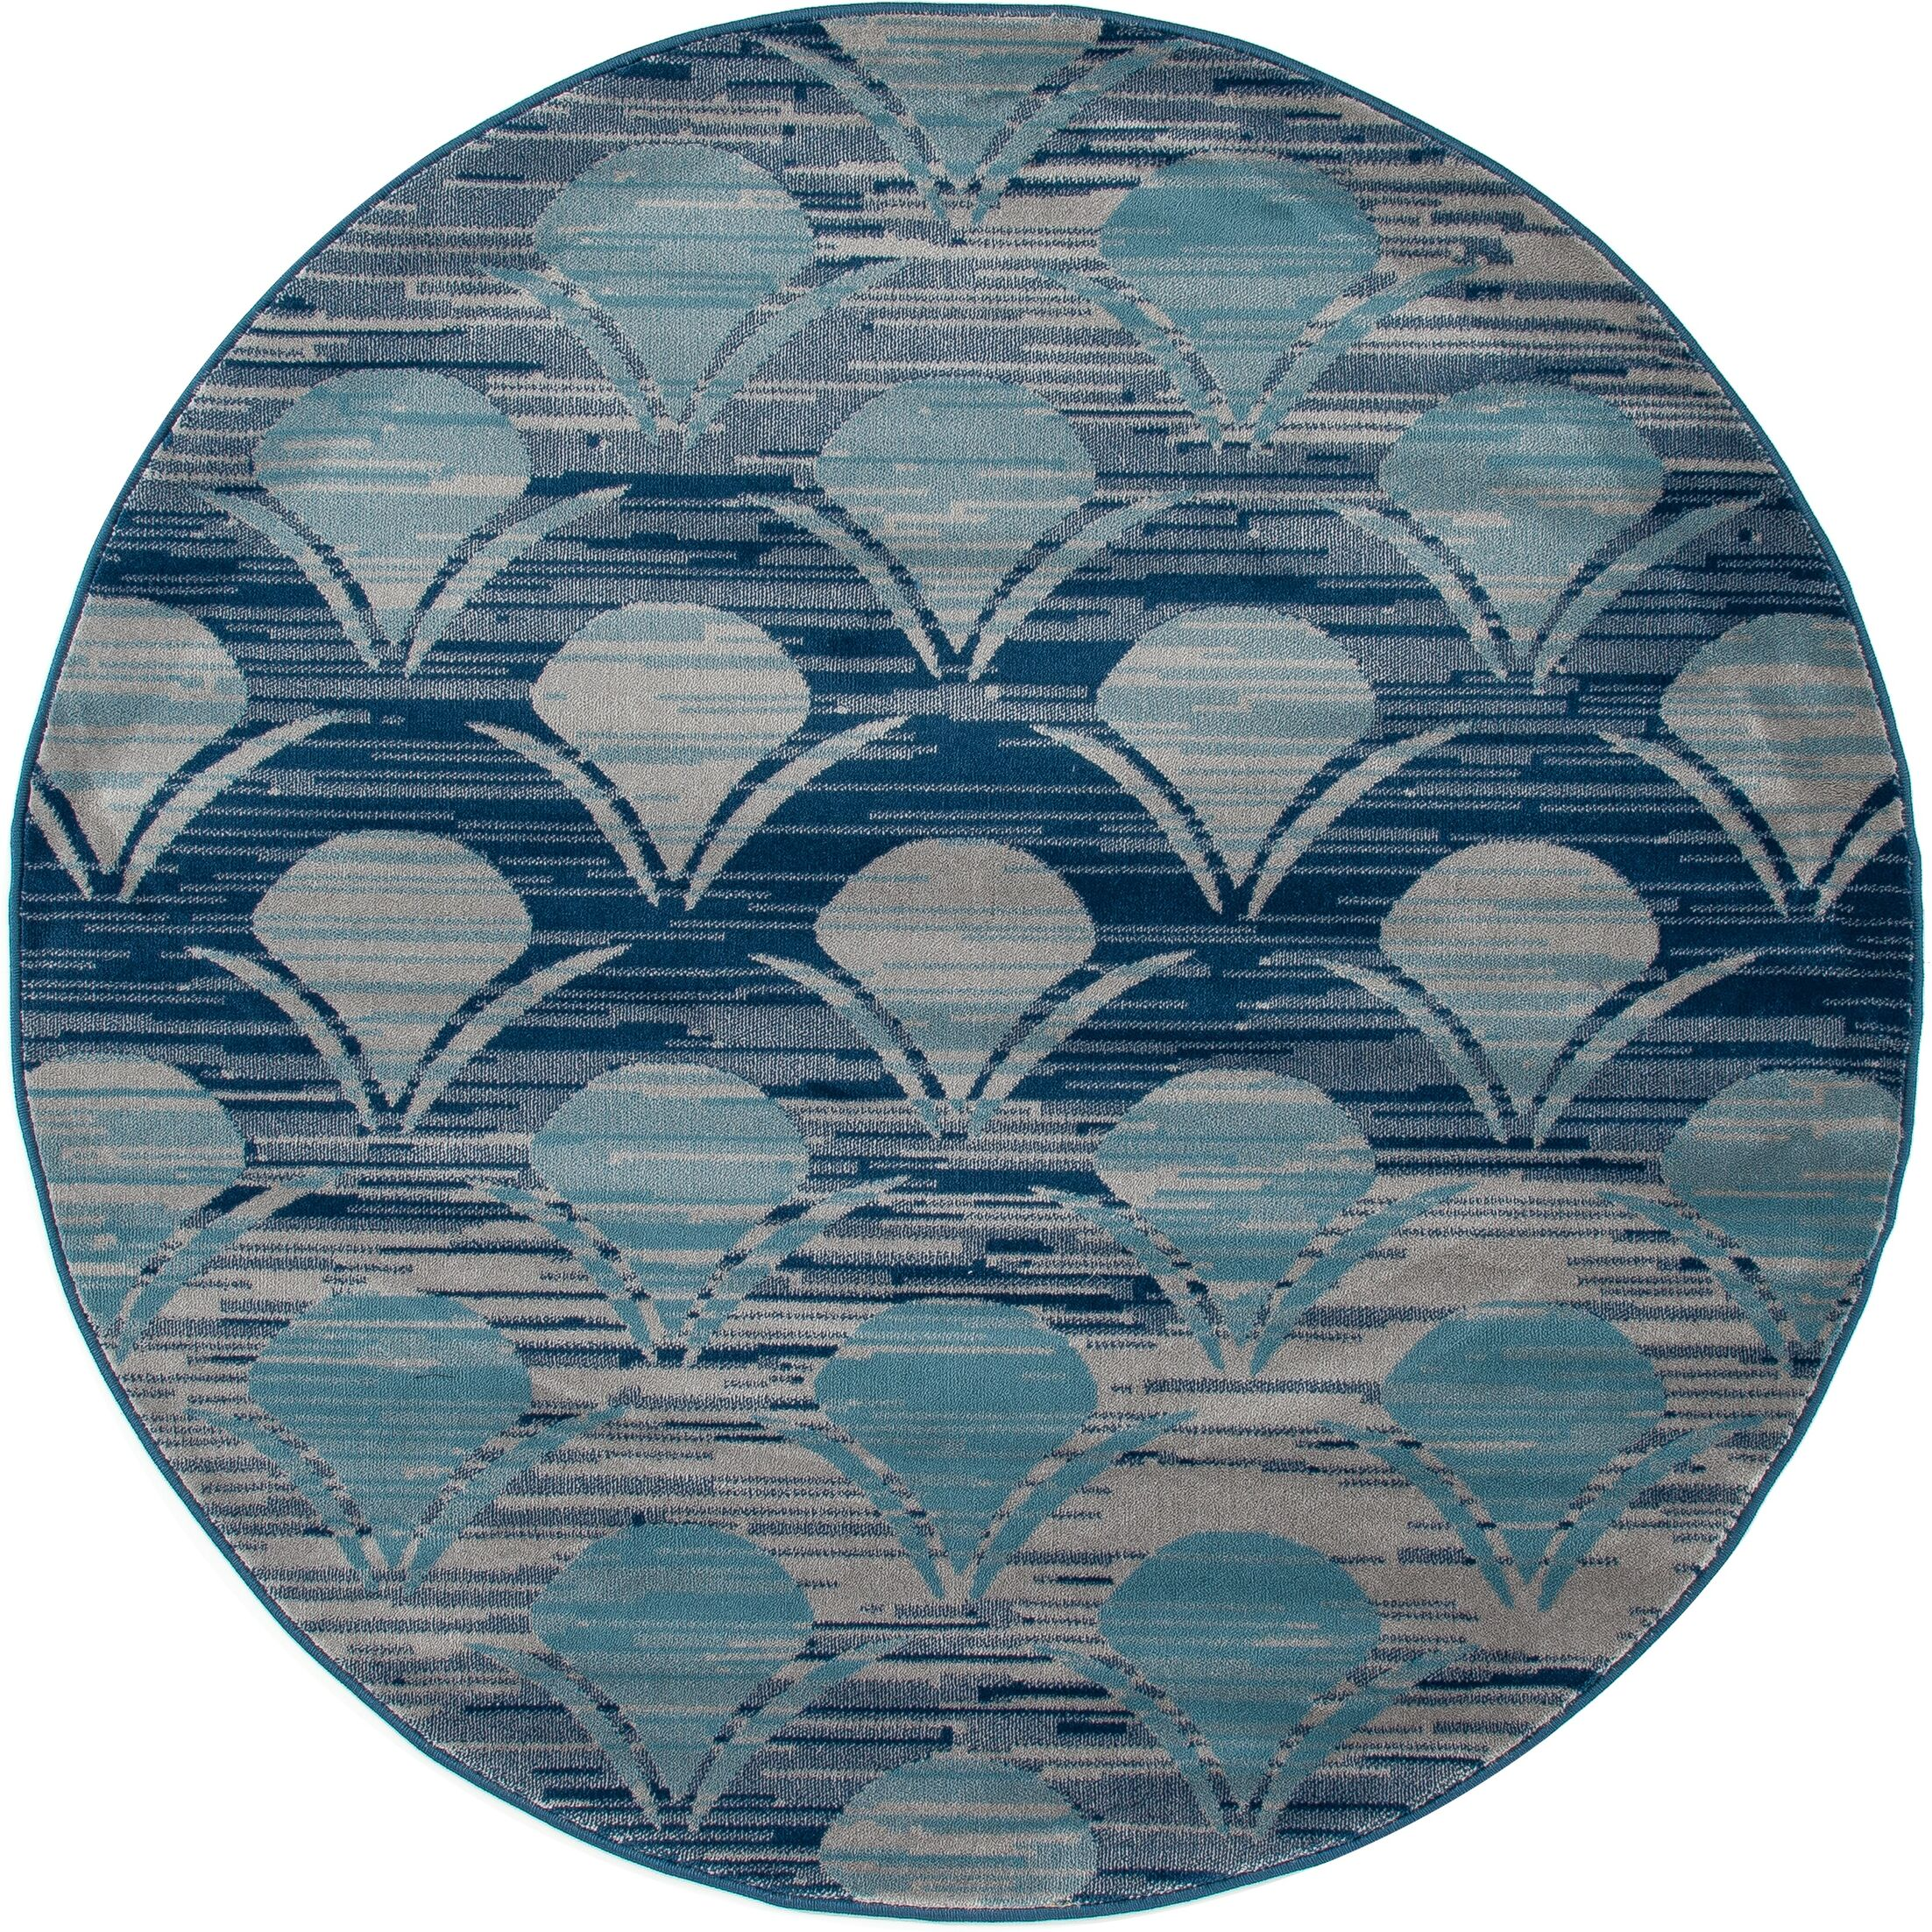 Ceasar Waves Gray Indoor/Outdoor Area Rug Rug Size: 9'2 x 12'4